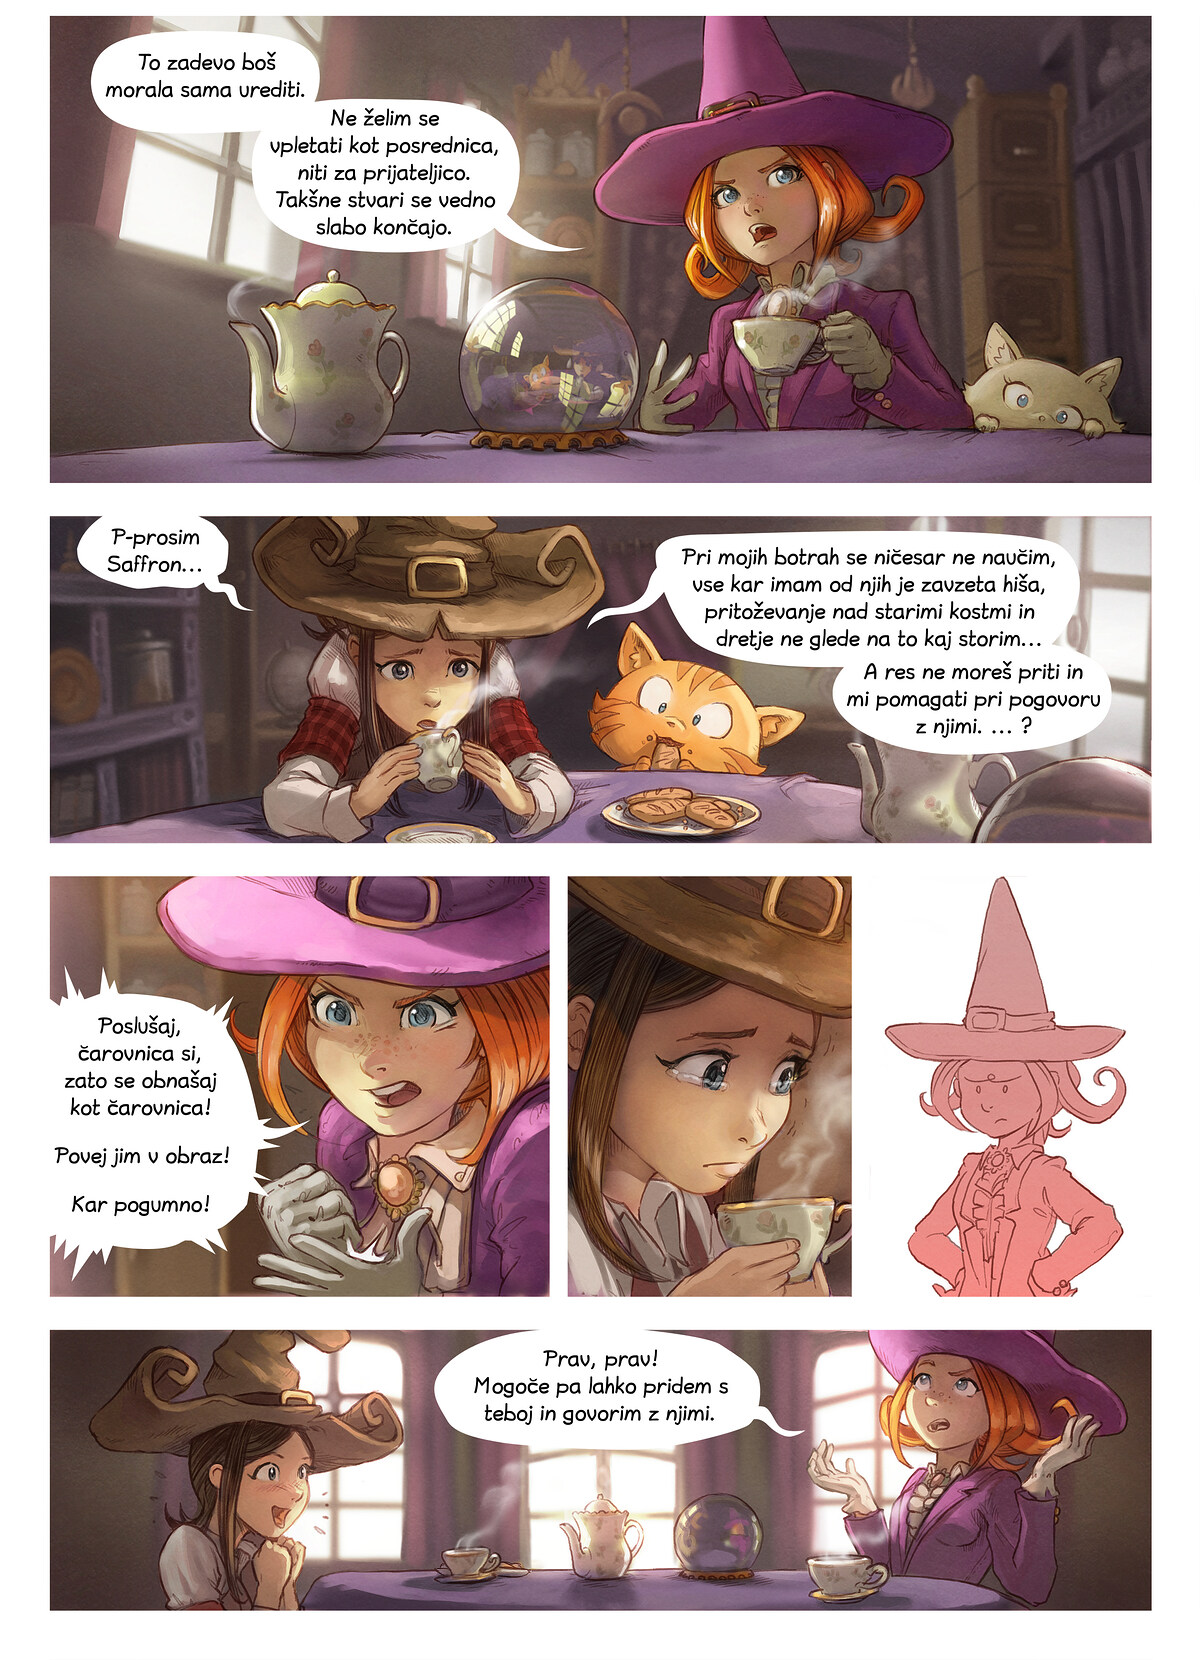 Epizoda 16: Modrec na gori, Page 2